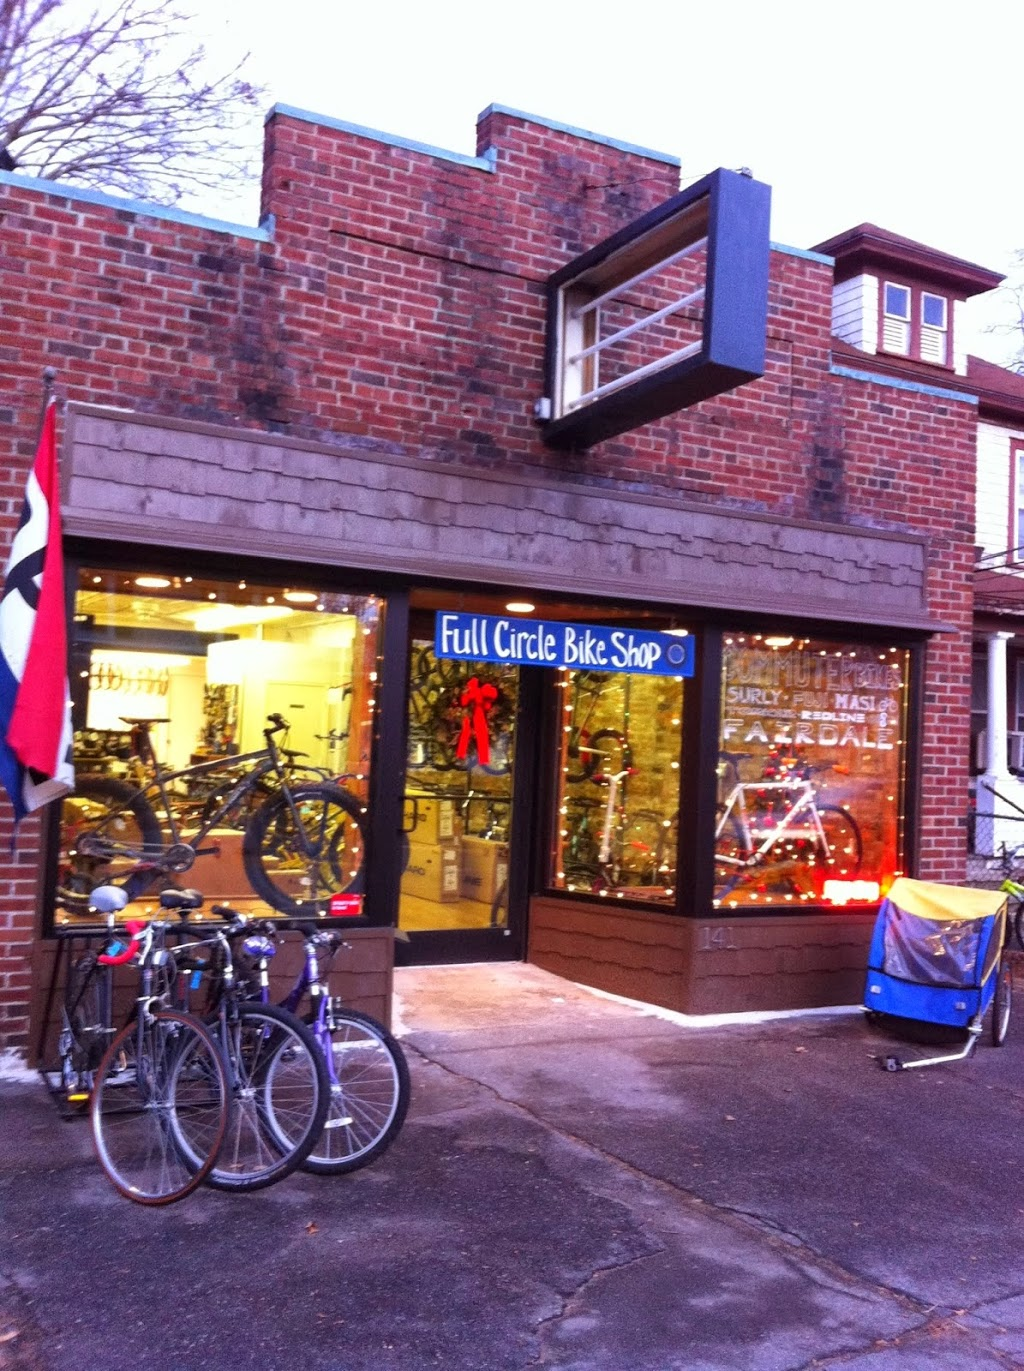 Full Circle Bike Shop - bicycle store  | Photo 1 of 9 | Address: 30 N Maple St, Florence, MA 01062, USA | Phone: (413) 585-8700